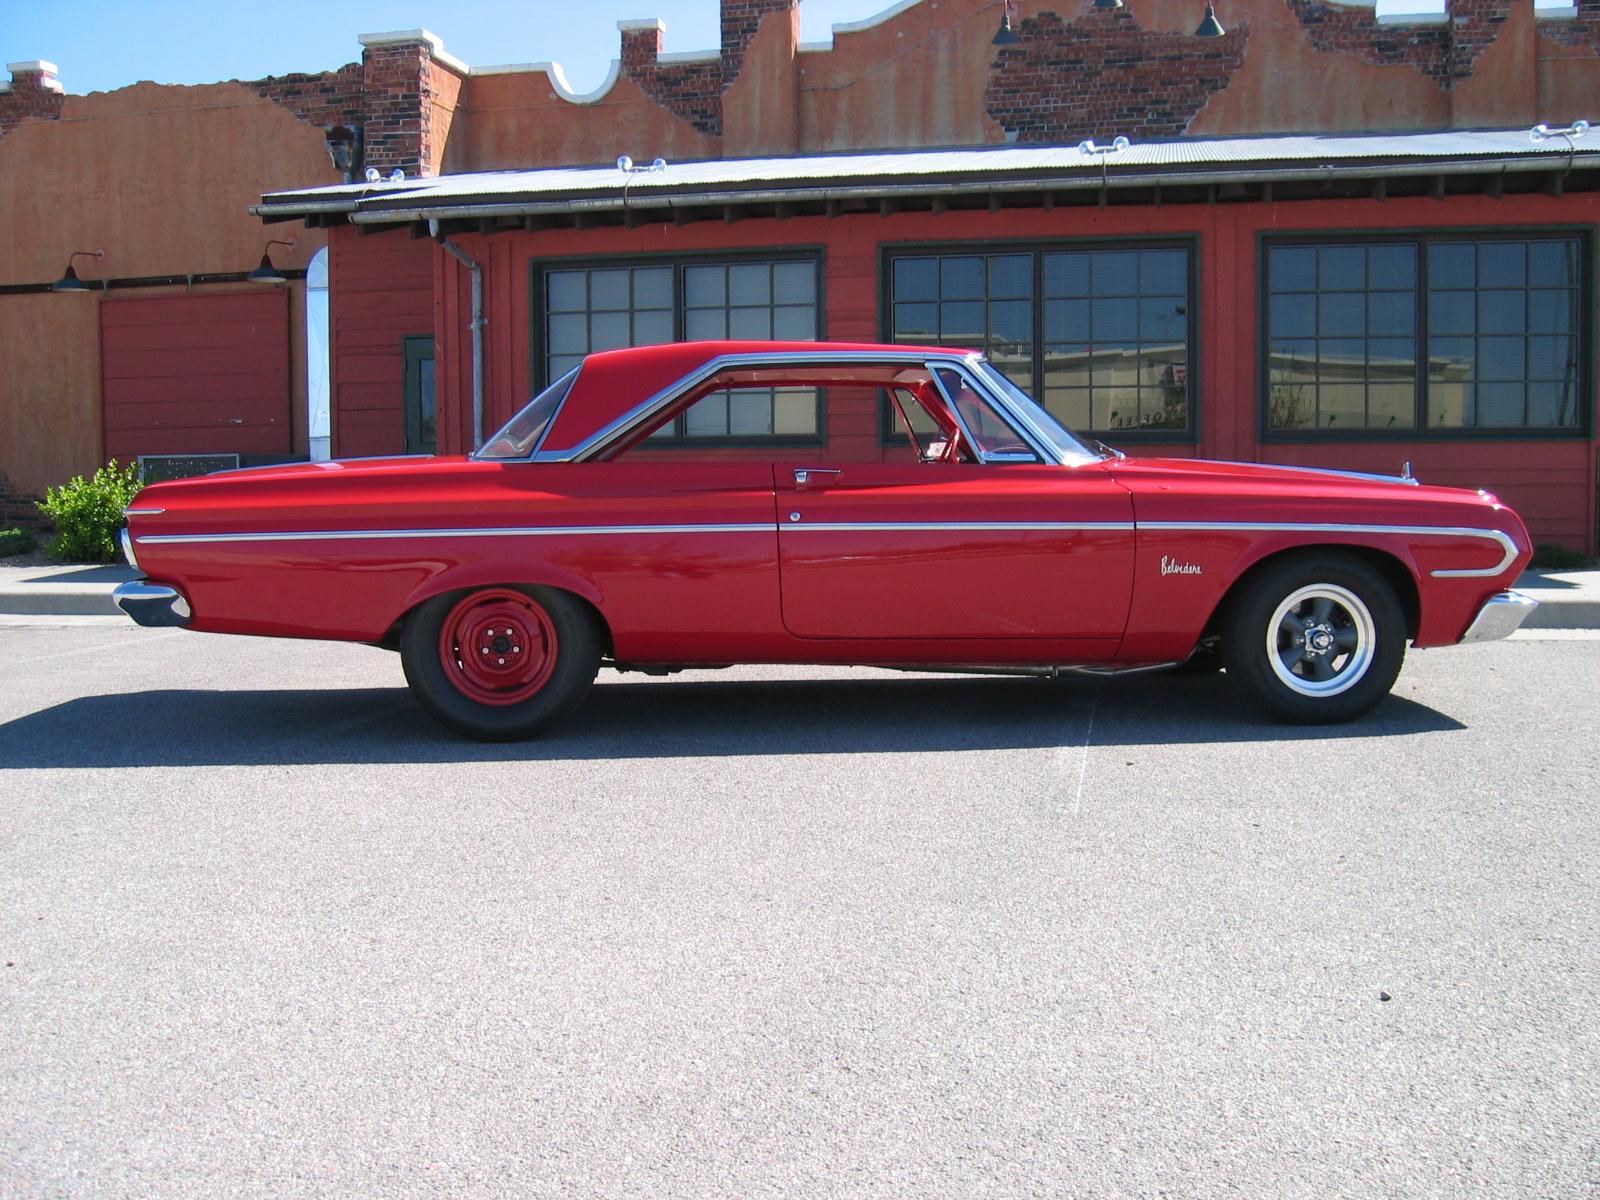 Car 1: 64 Belvedere